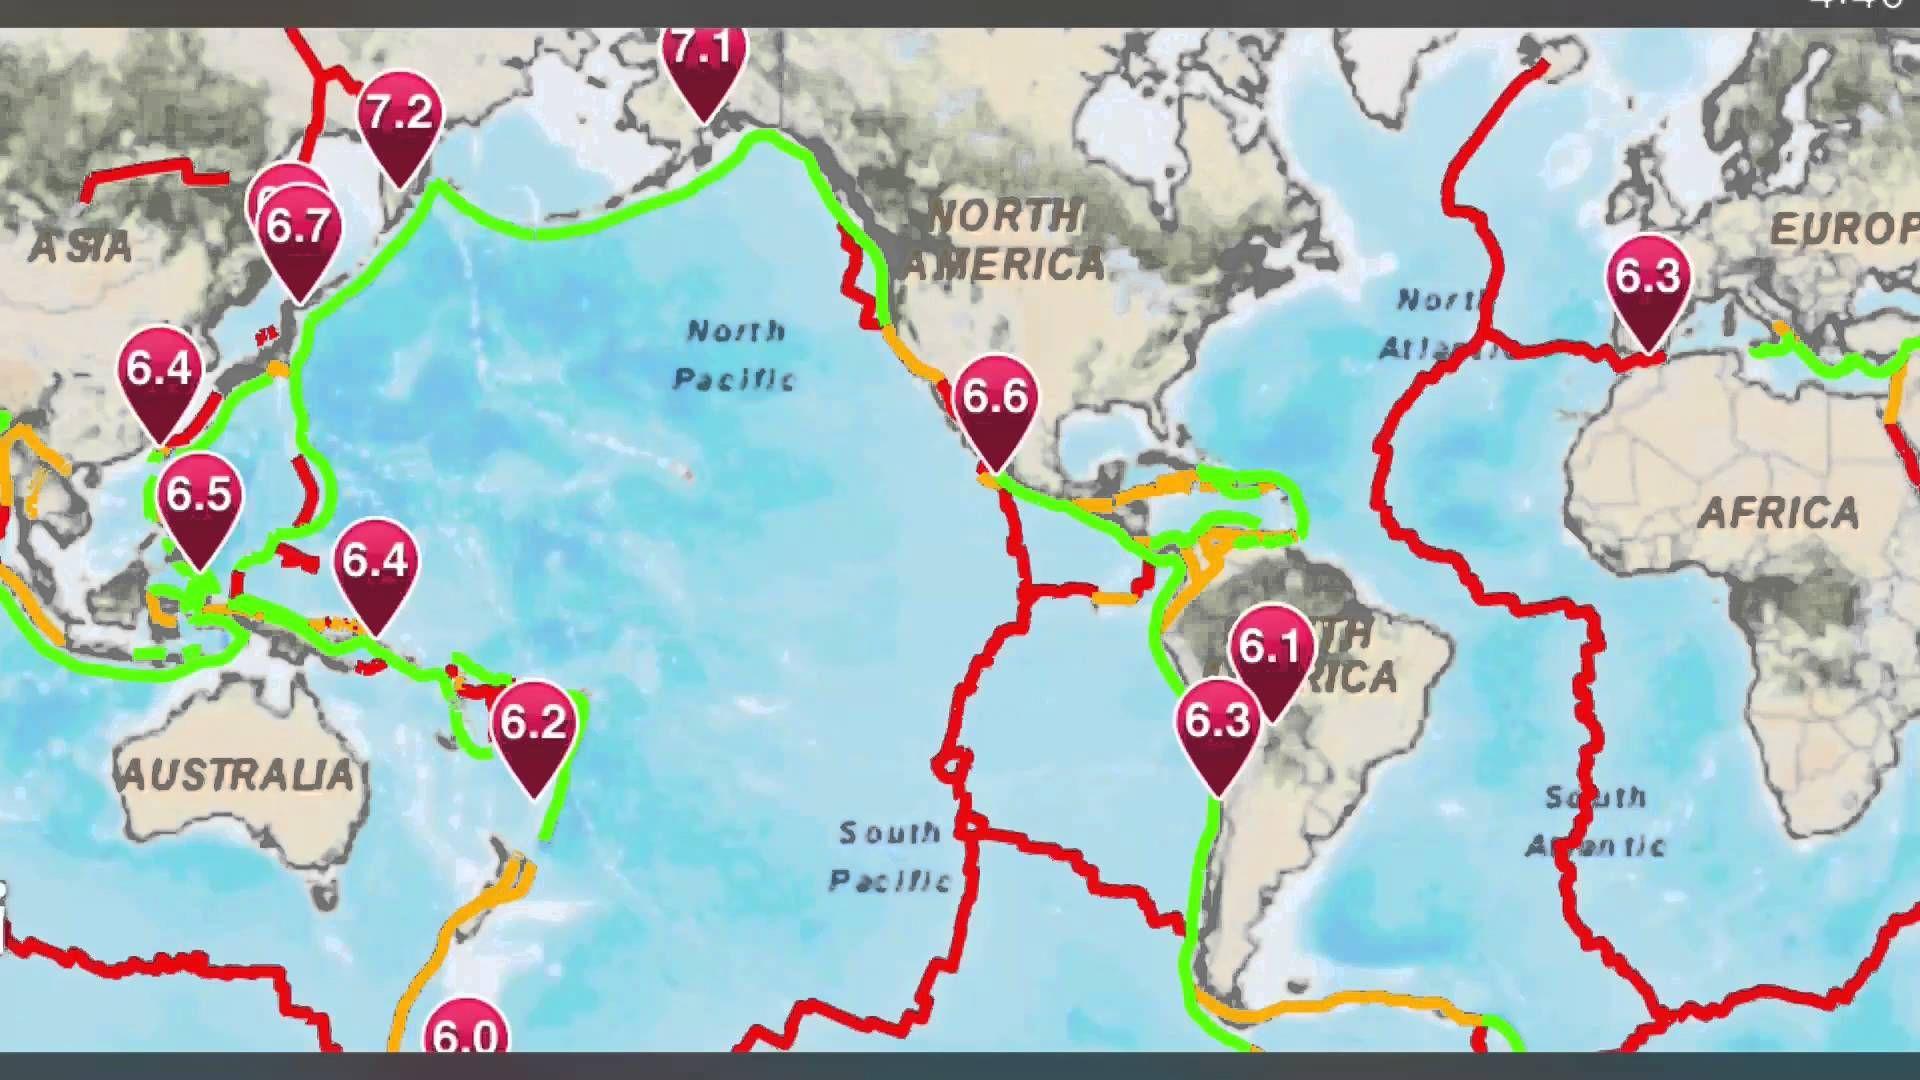 Earthquakes Increasing 2016 Earthquake